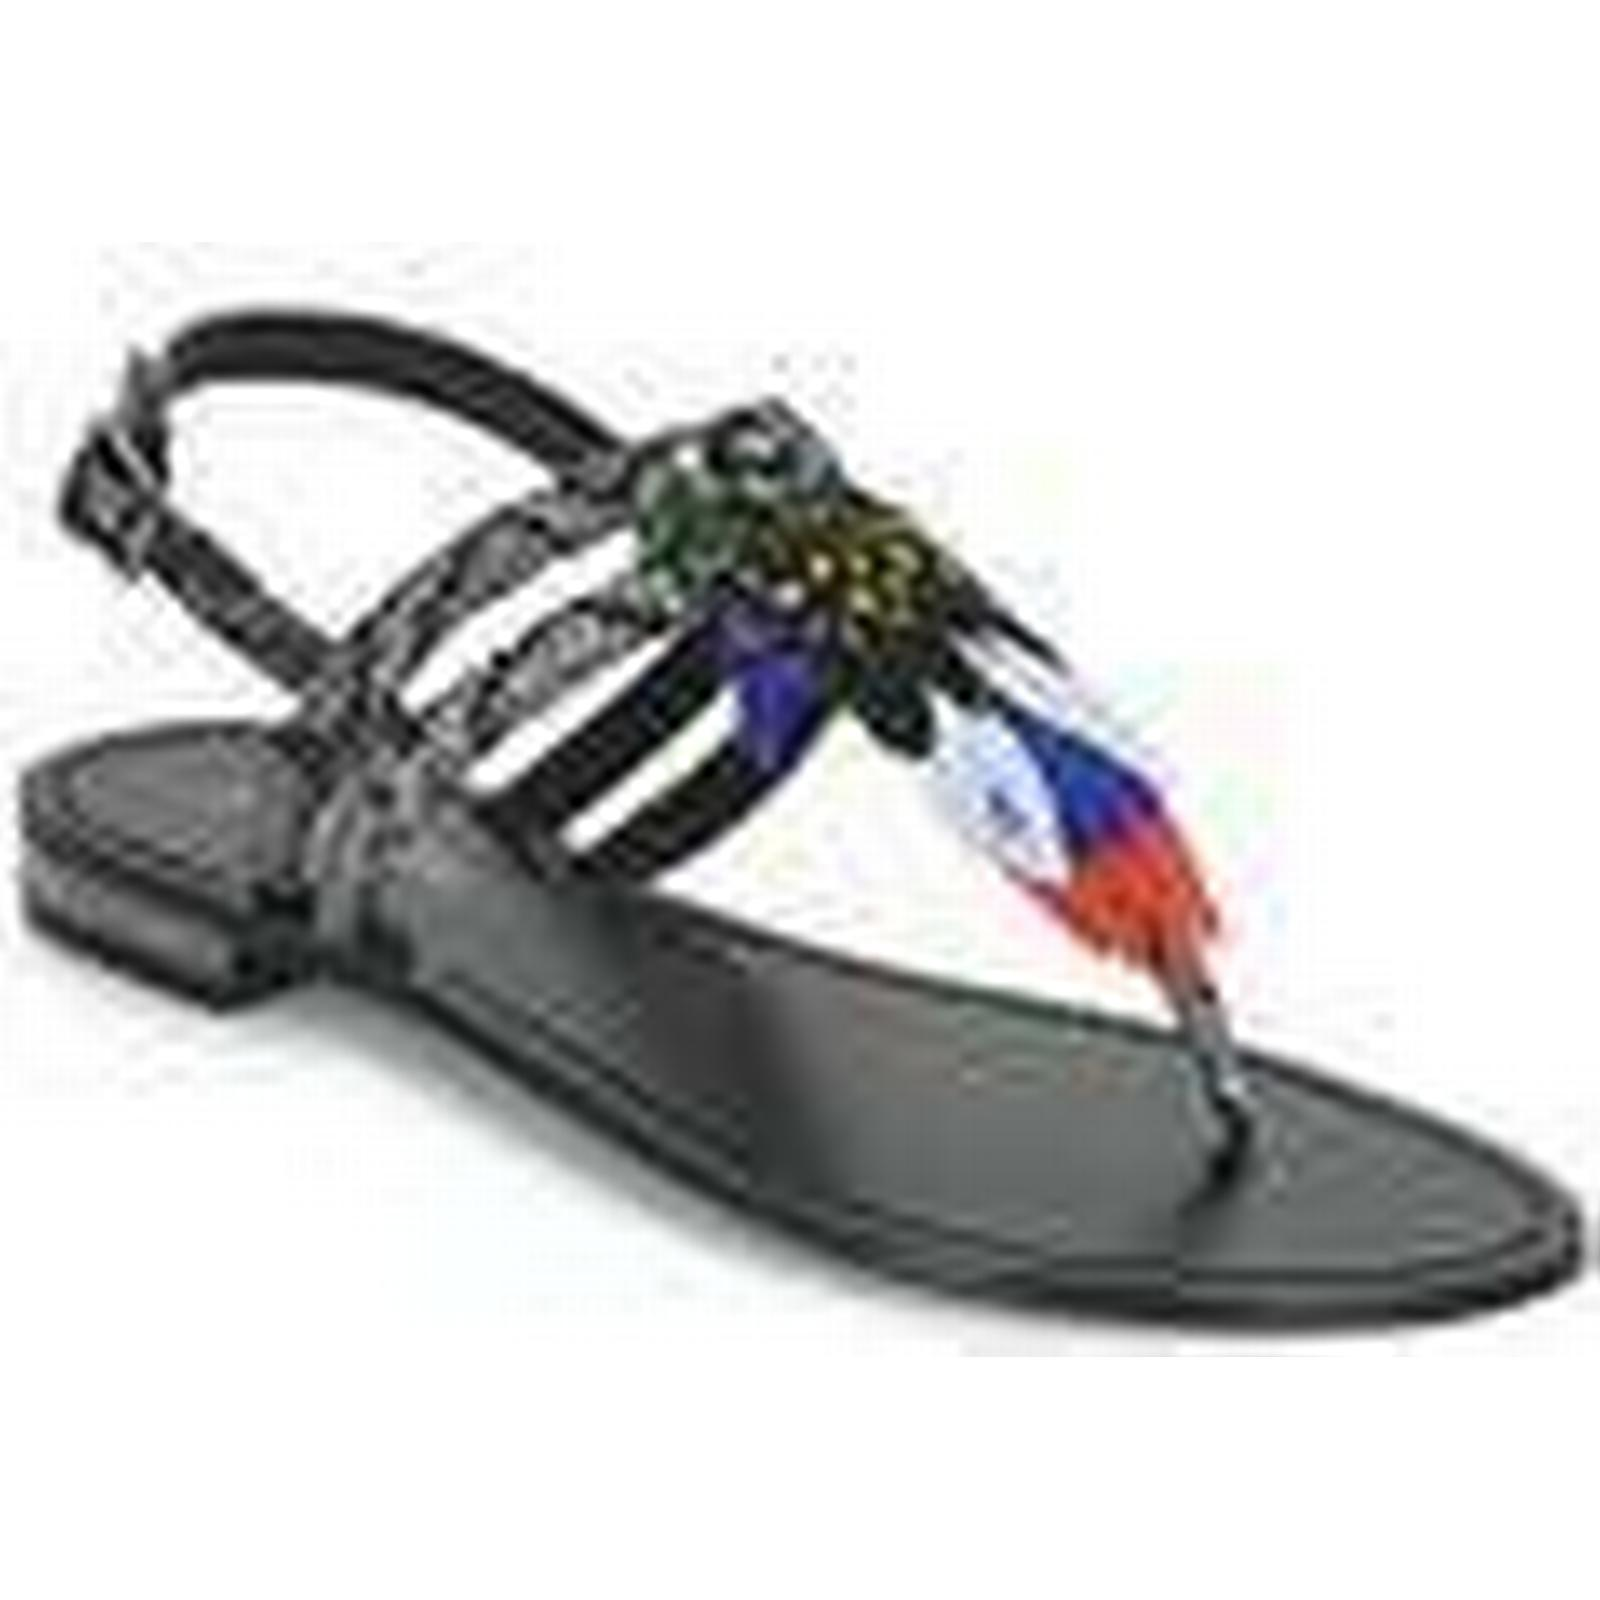 the latest f6c4e 6f2de Metamorf Ose CARBONARA women s Flip flops   Sandals (Shoes) in Black 2a4e40